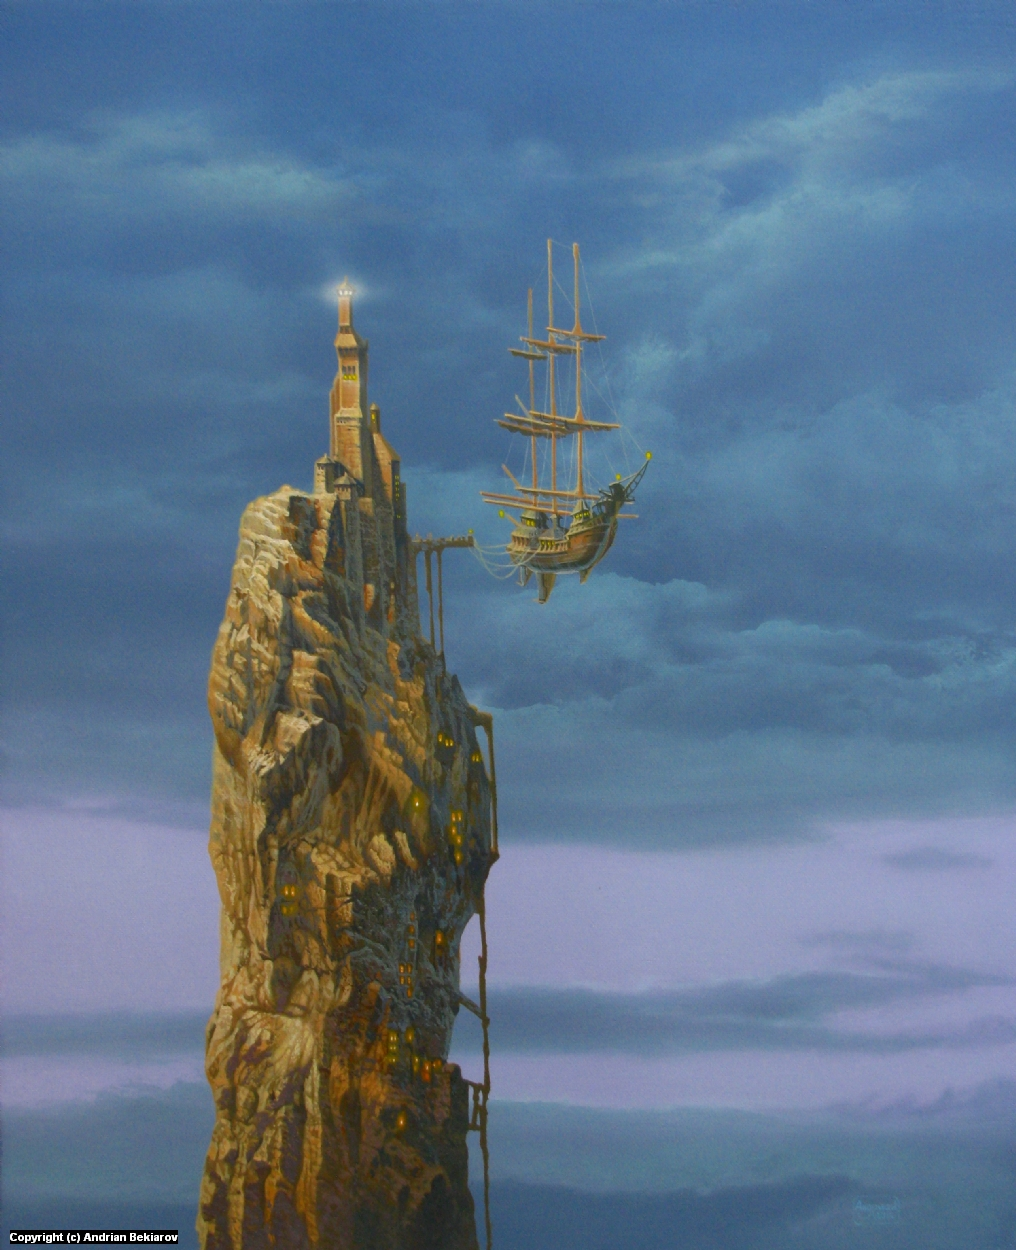 port Artwork by Andrian Bekiarov